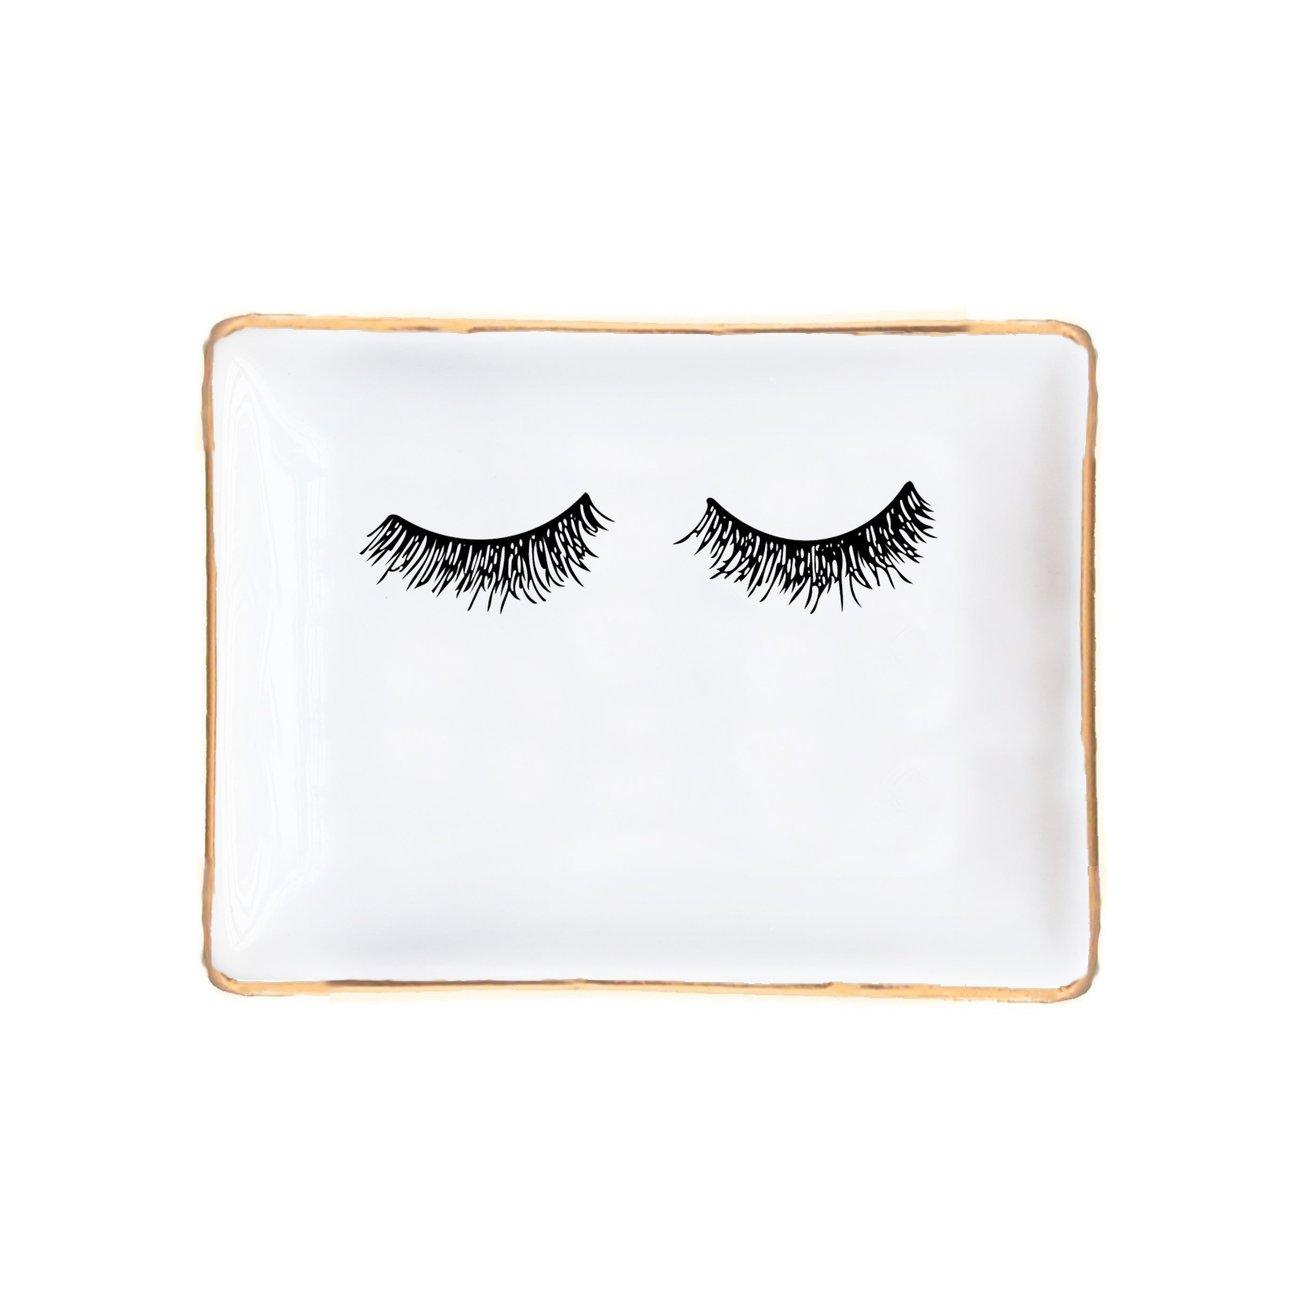 Eyelashes Jewelry Dish | Ring Storage Gold Ceramic Tray Small Decor Accessories